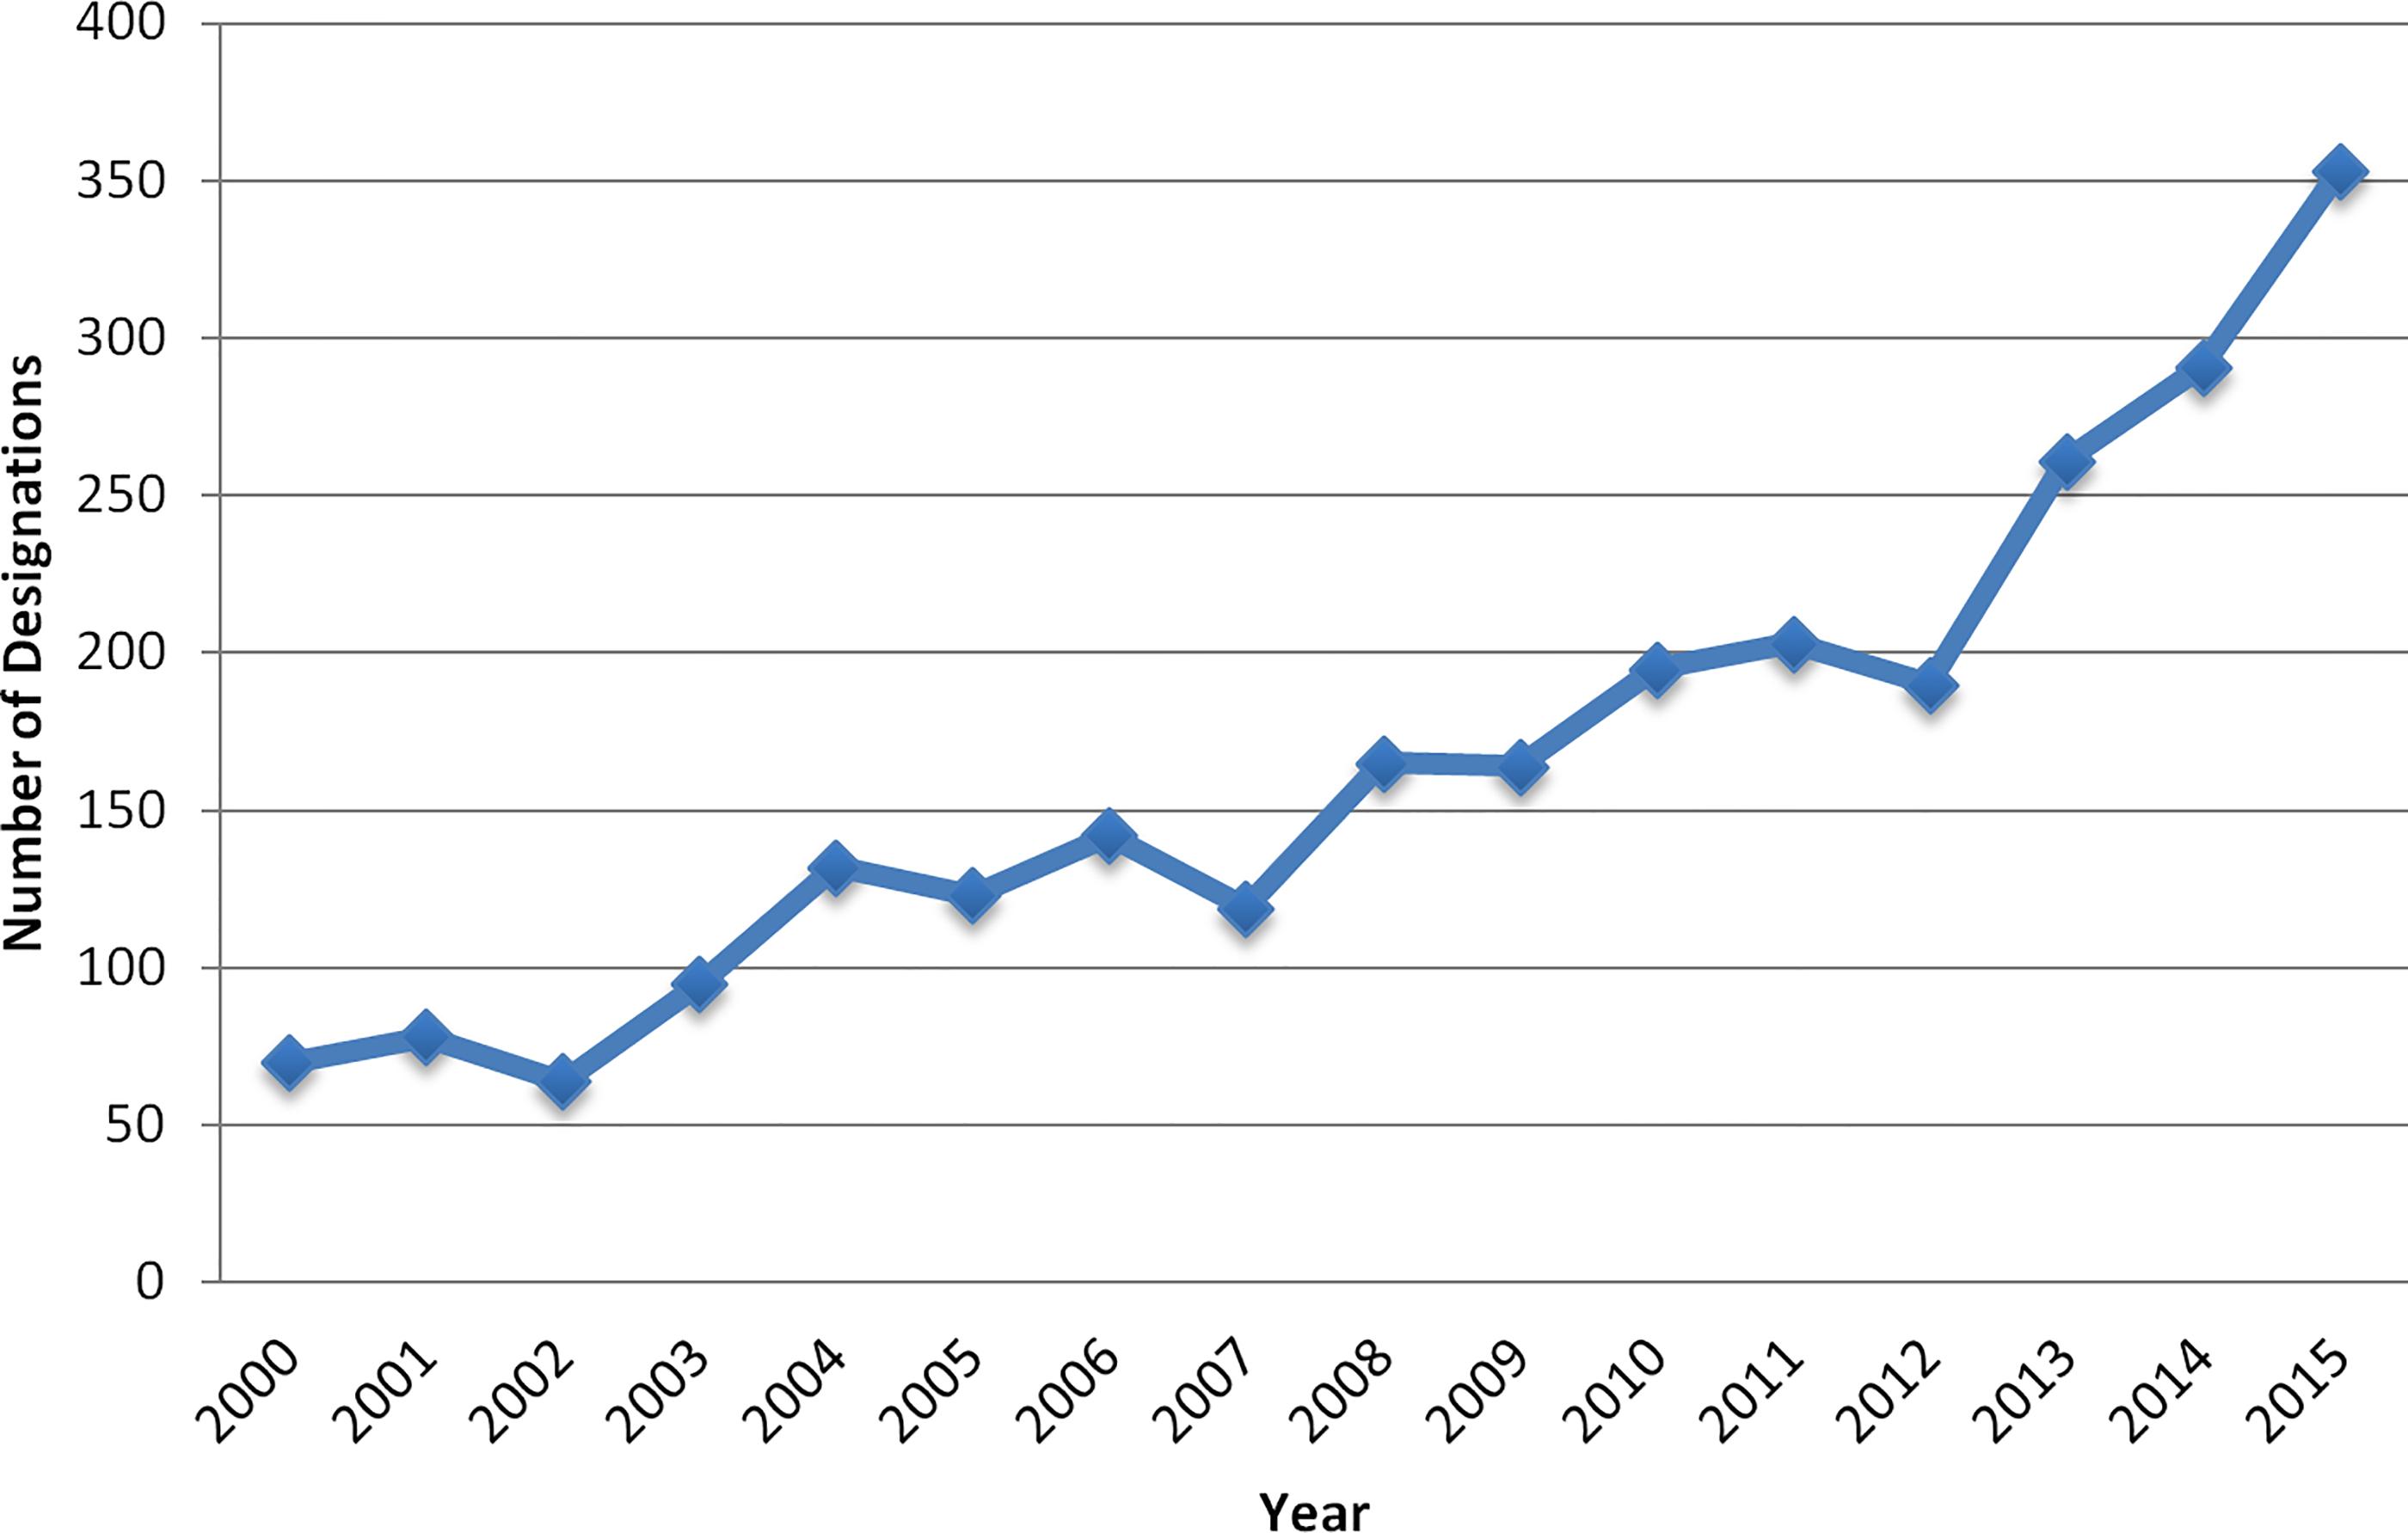 Orphan drug designations per year.